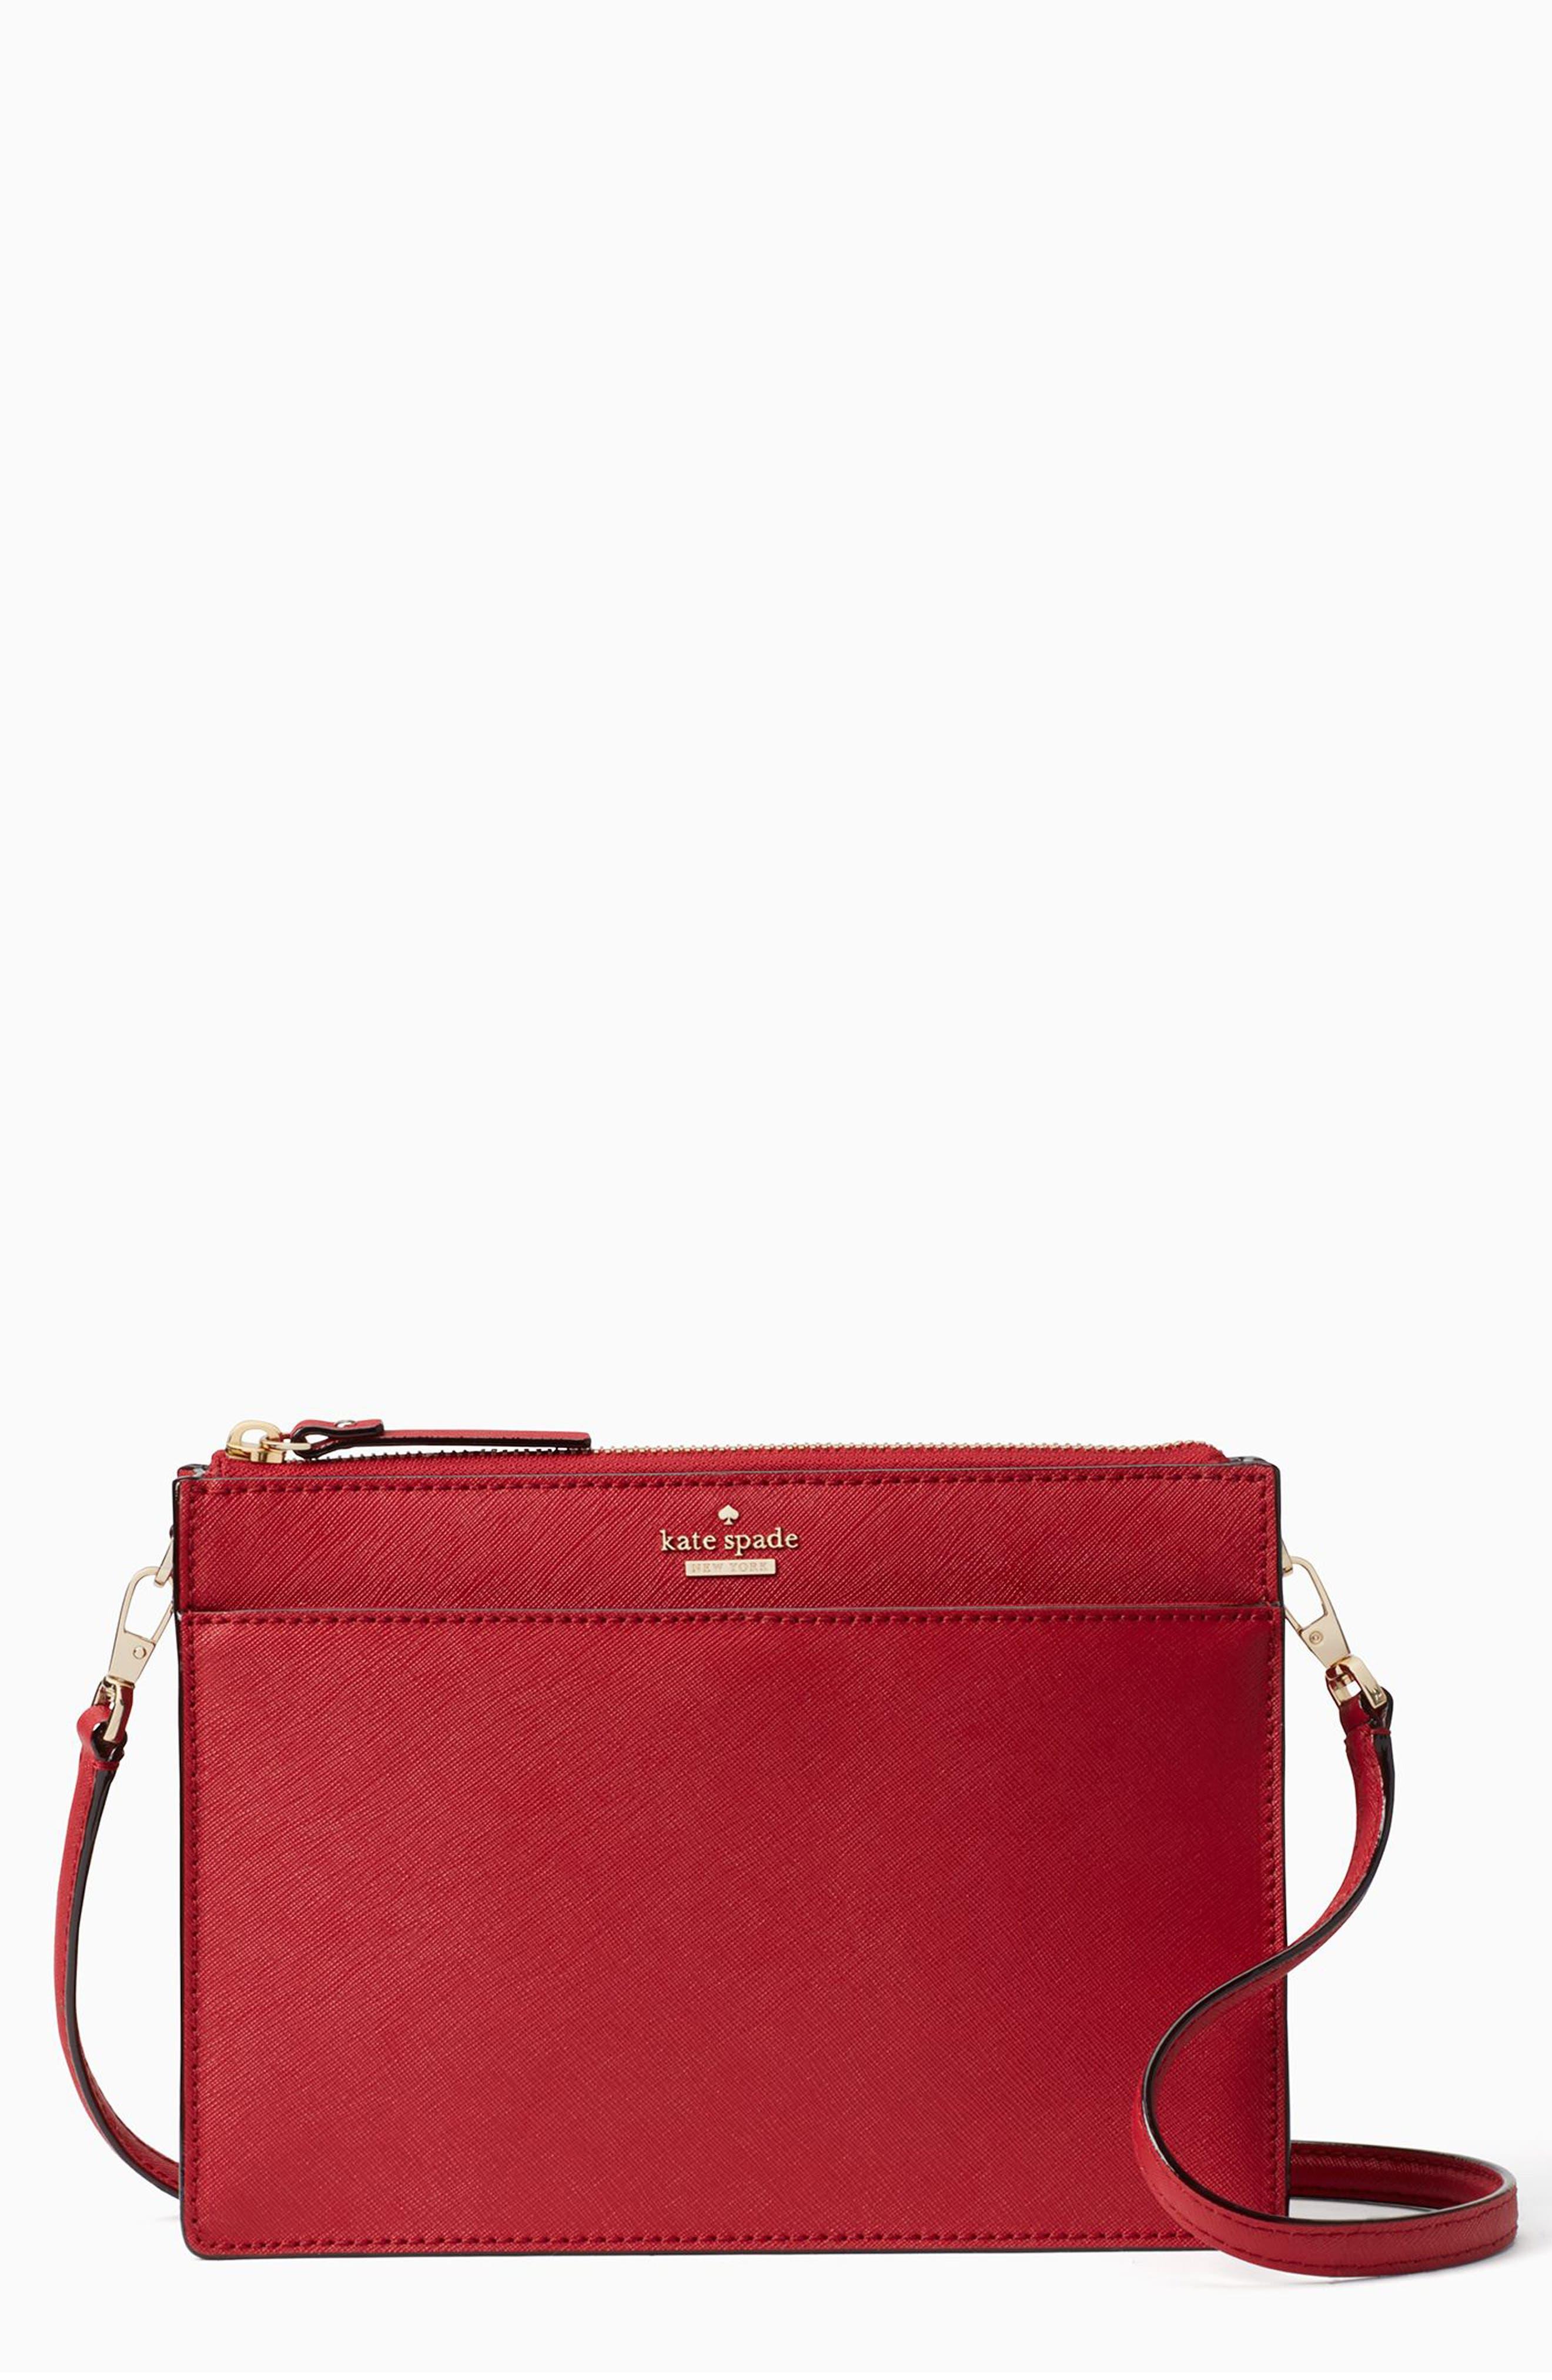 cameron street clarise leather shoulder bag,                             Main thumbnail 1, color,                             Sienna